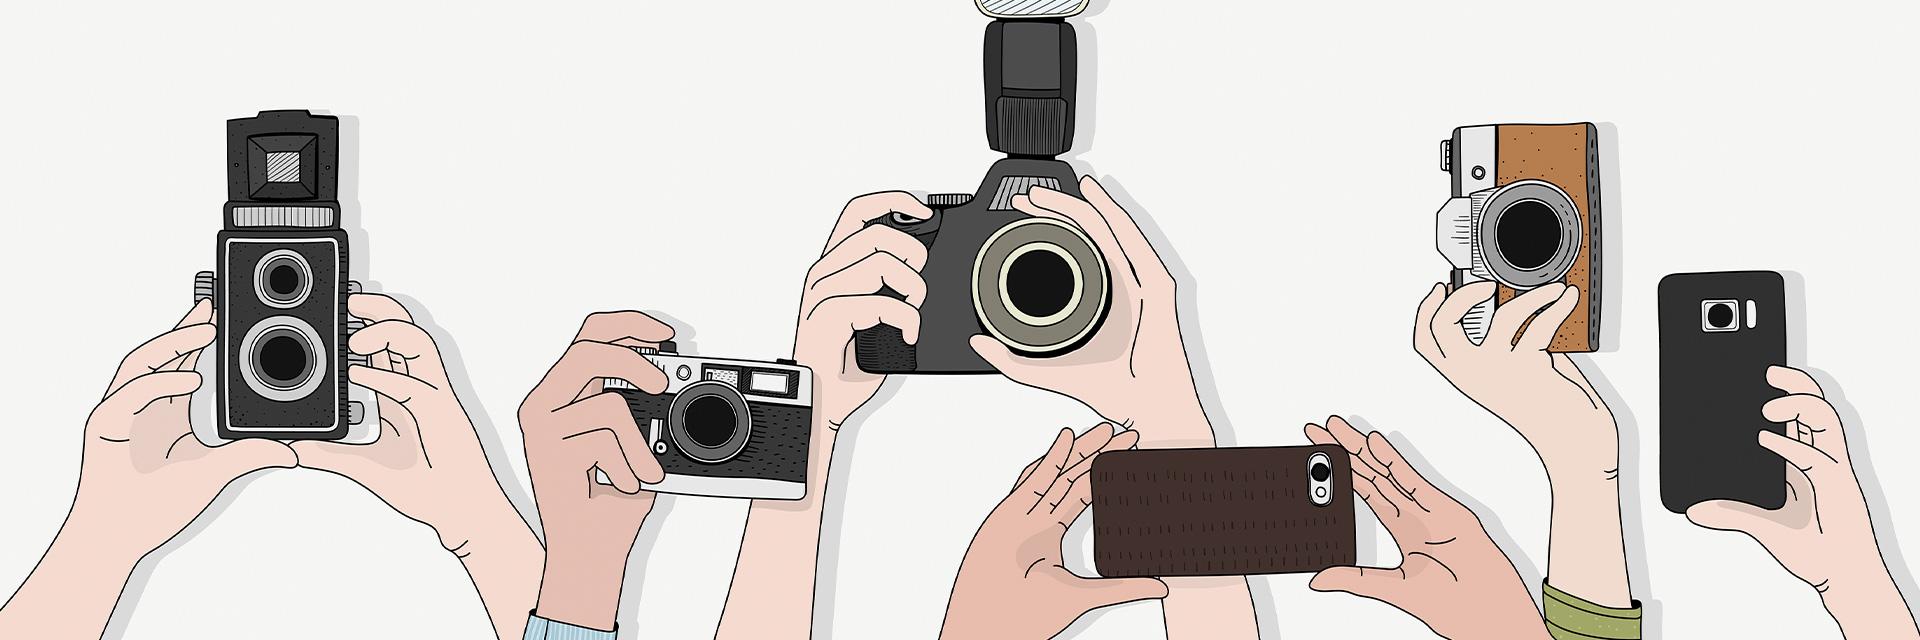 Huawei p50 получит апгрейд камеры от sony